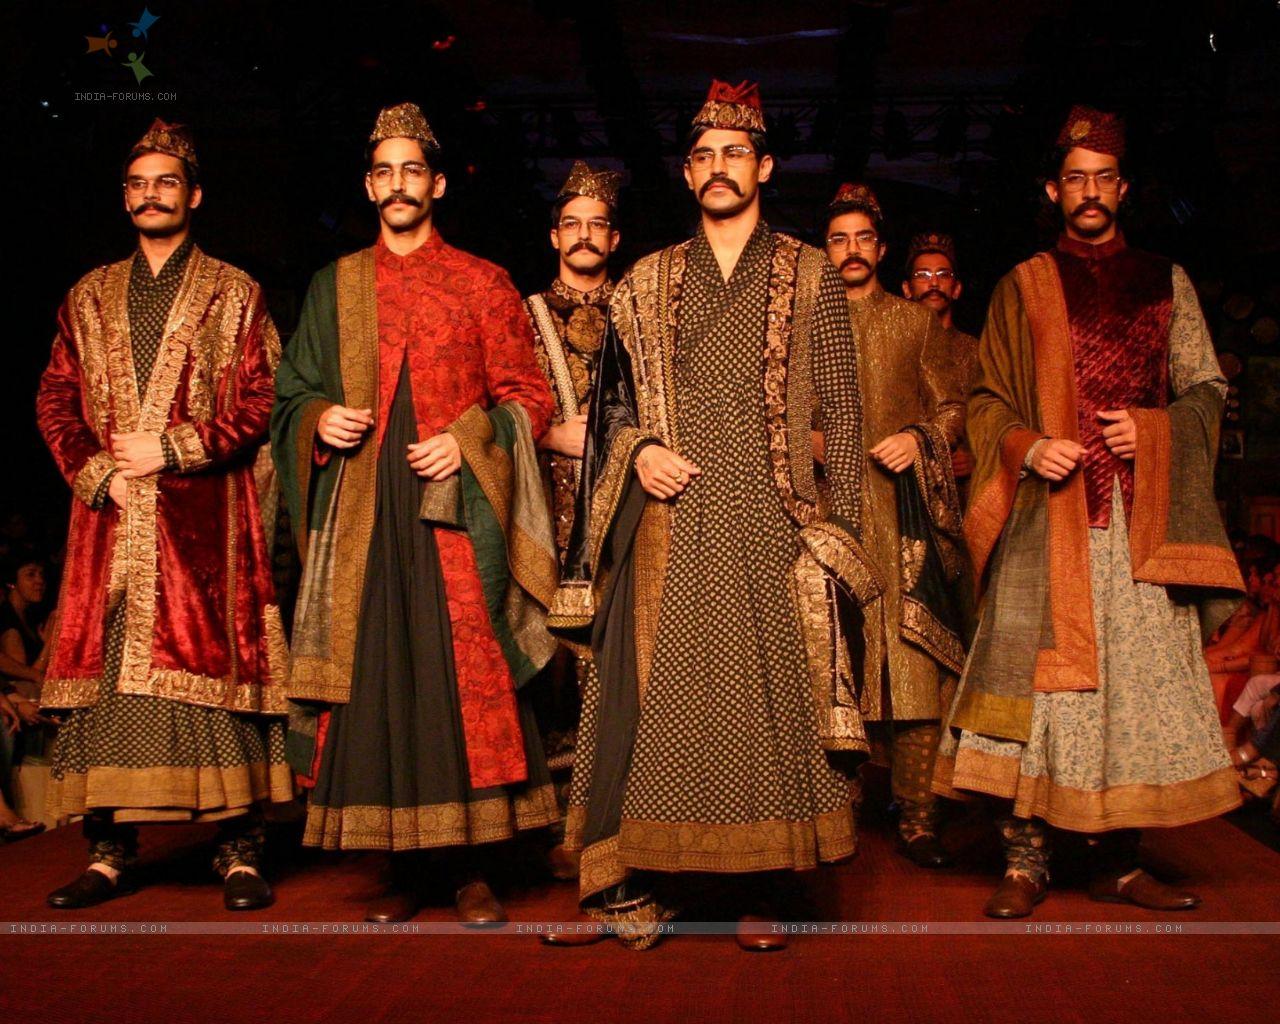 90679-models-showcasing-designer-sabyasachi-mukherjee-creations-at-the